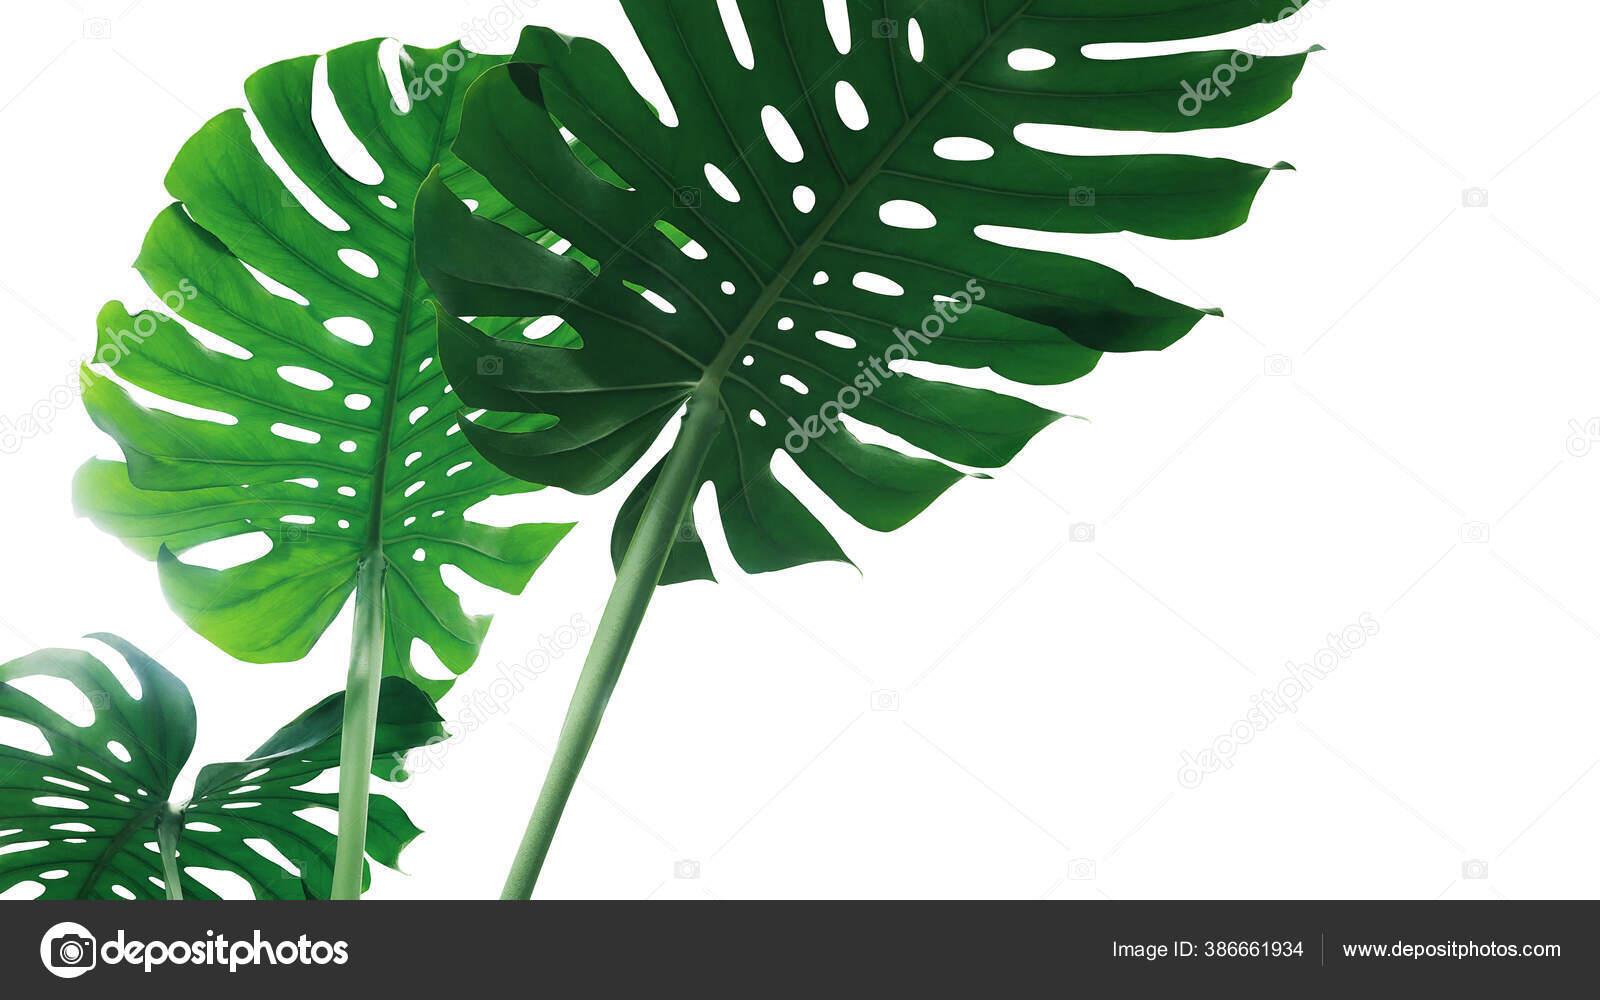 depositphotos 386661934 stock photo green leave monstera plant split